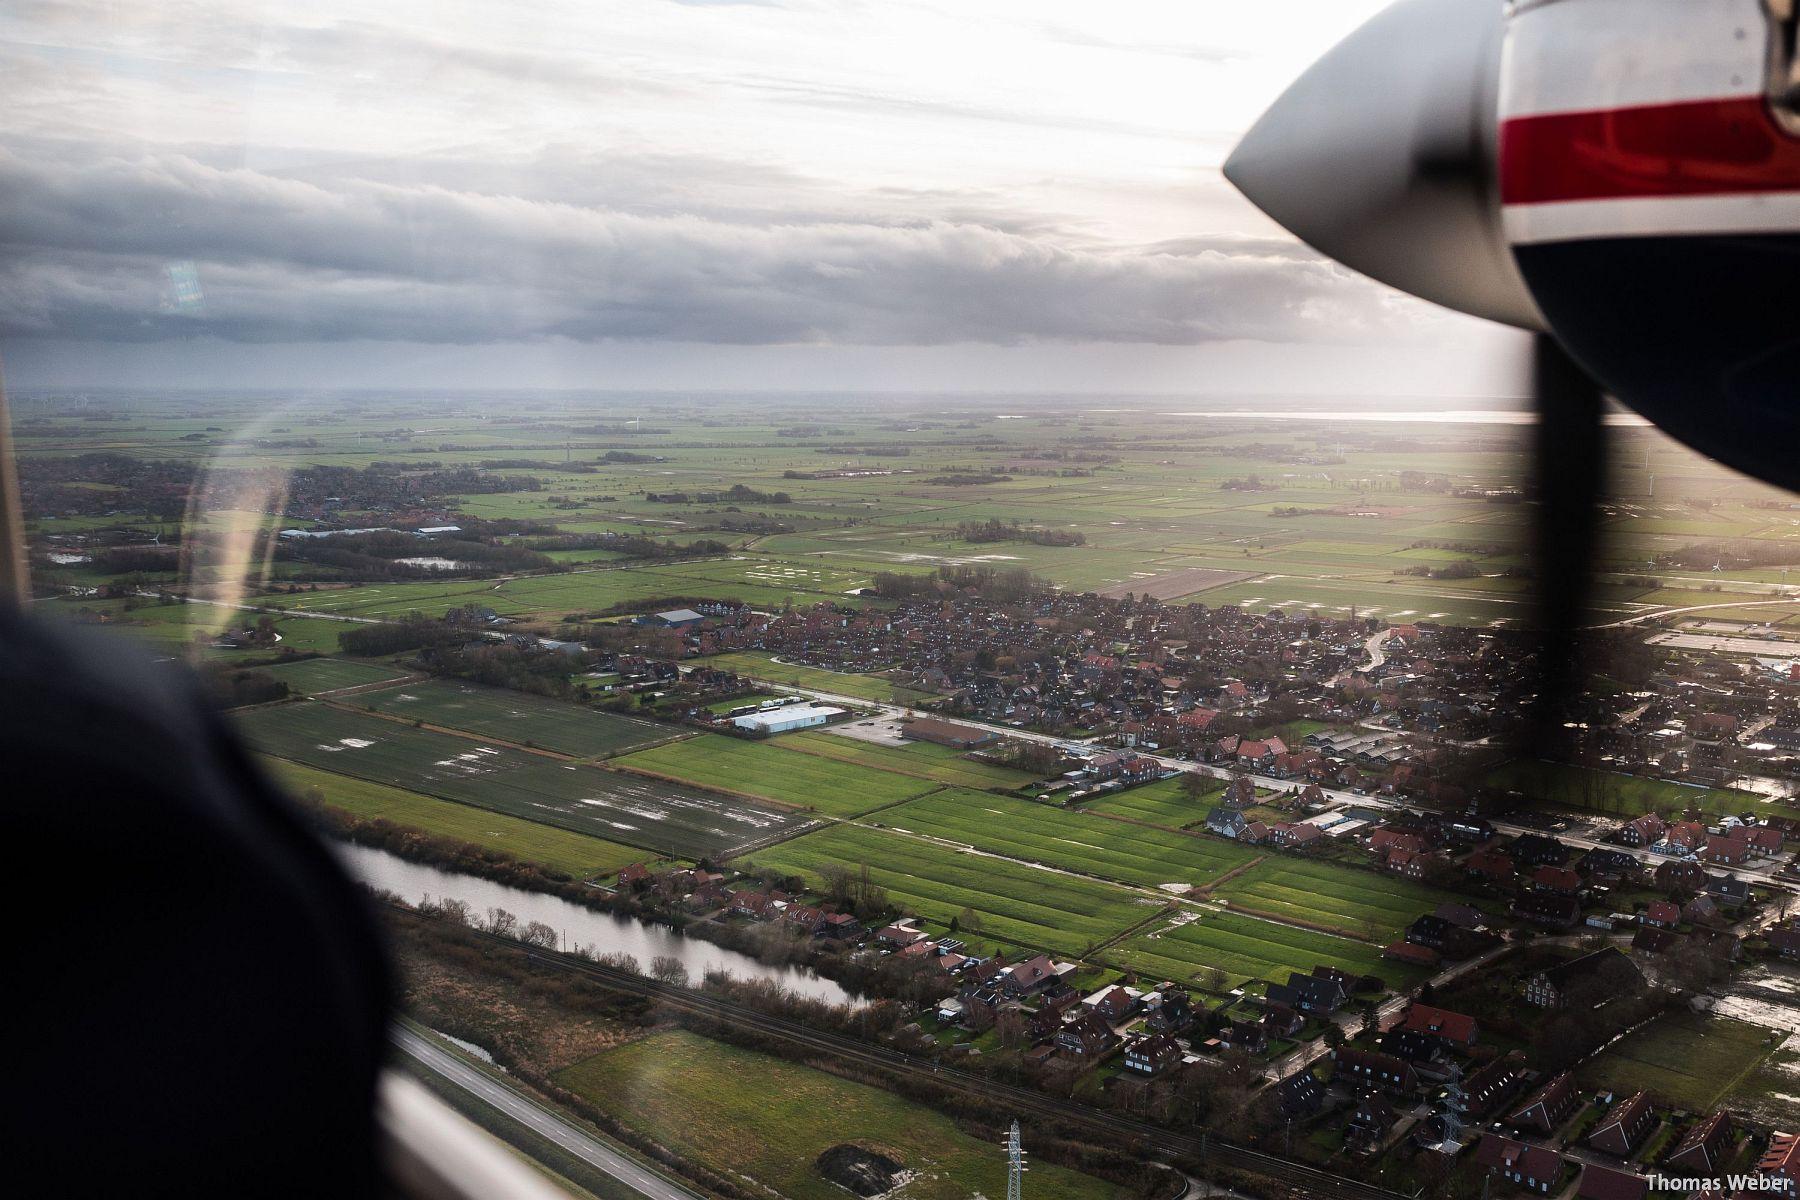 Fotograf Thomas Weber aus Oldenburg: Flucht vor dem Orkan Xaver mit dem Inselflieger Juist (10)